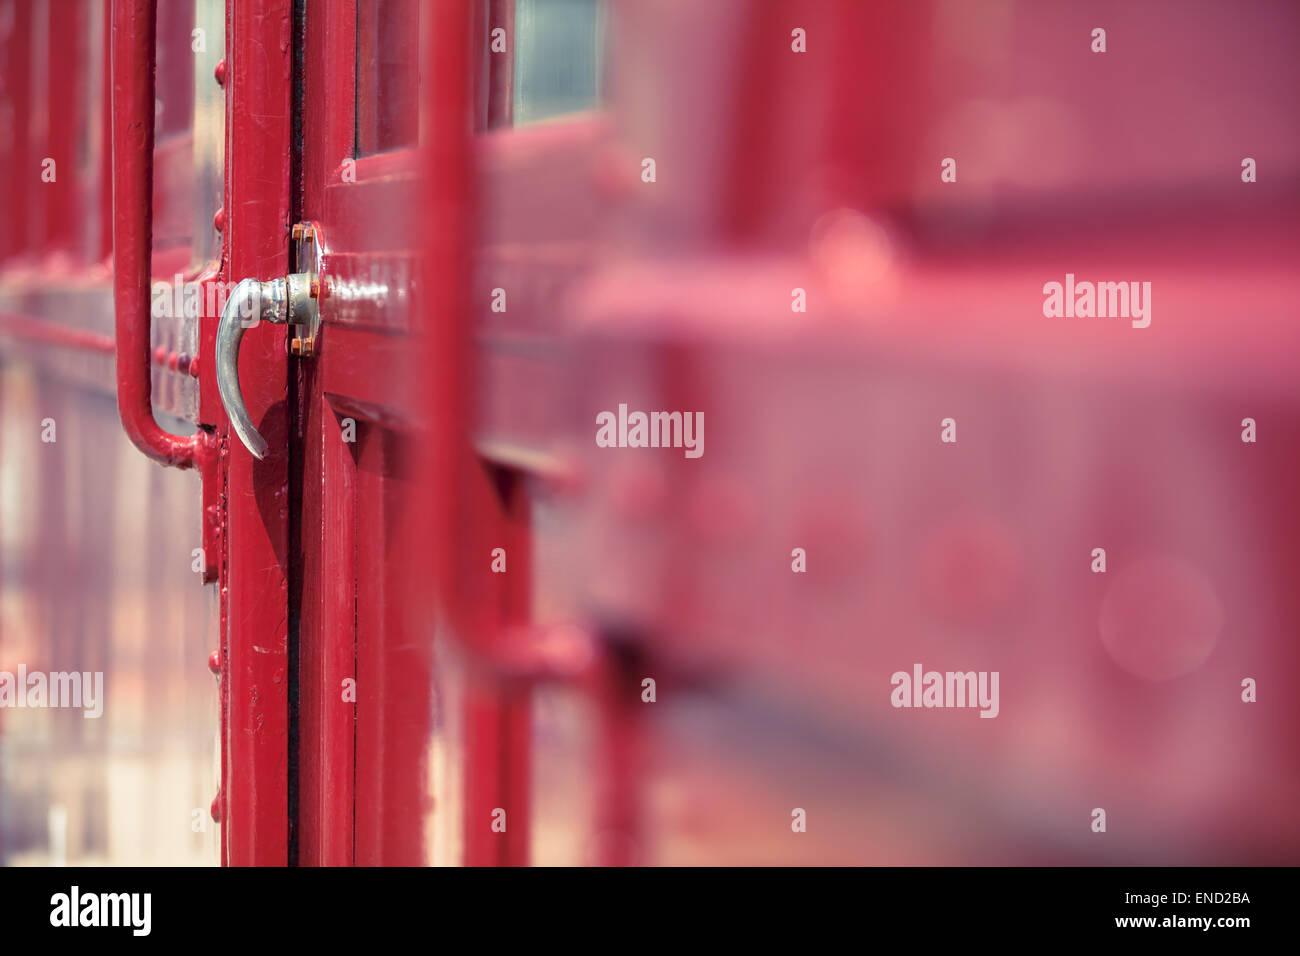 Detail of red closed nostalgic vintage railway car door - Stock Image